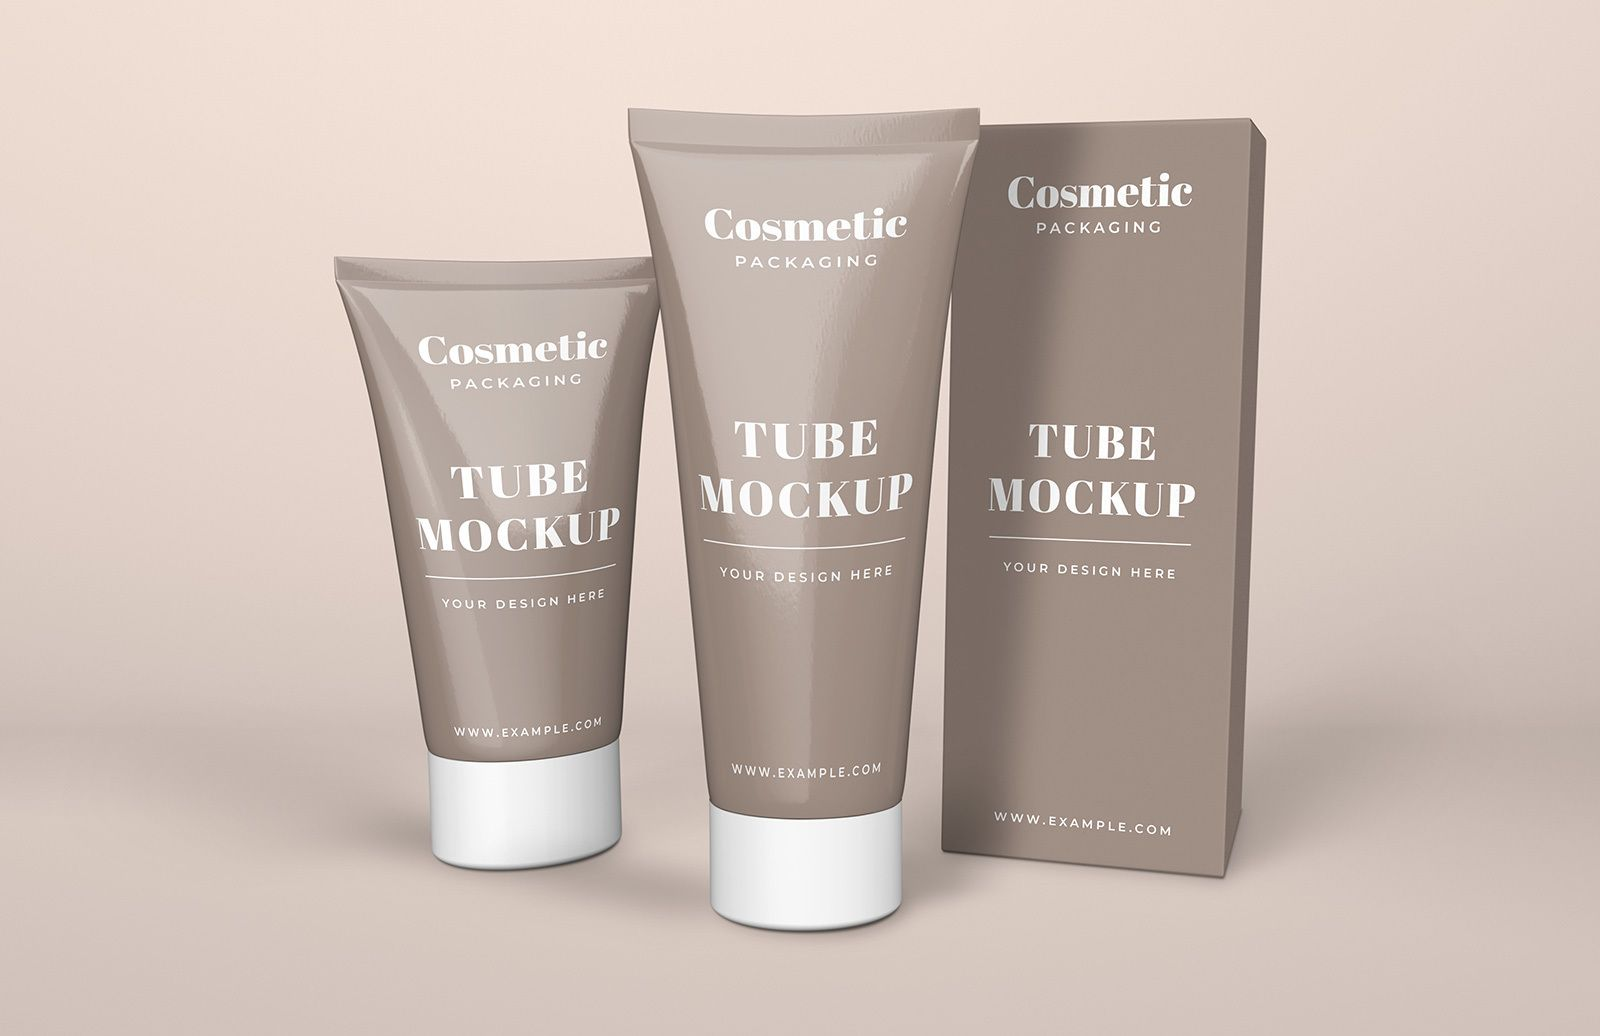 Cosmetic Tube Box Mockup Preview 1